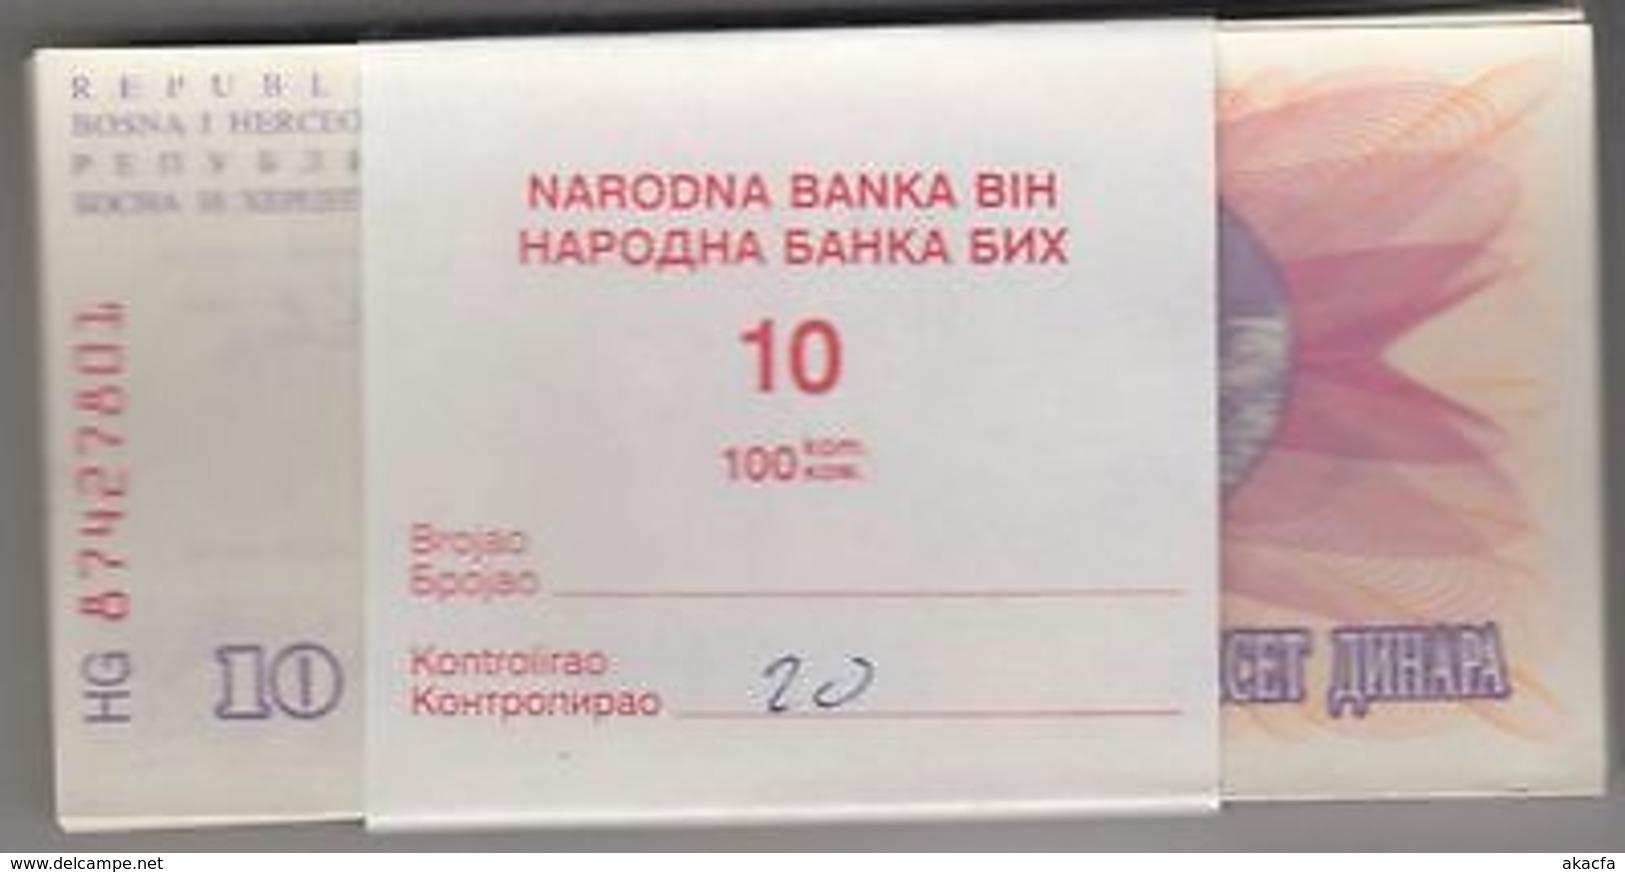 BOSNIE Herzégovine 1992 10 Dinara Bundle 100pcs UNC. Billets P 10 Wholesale - Bankbiljetten